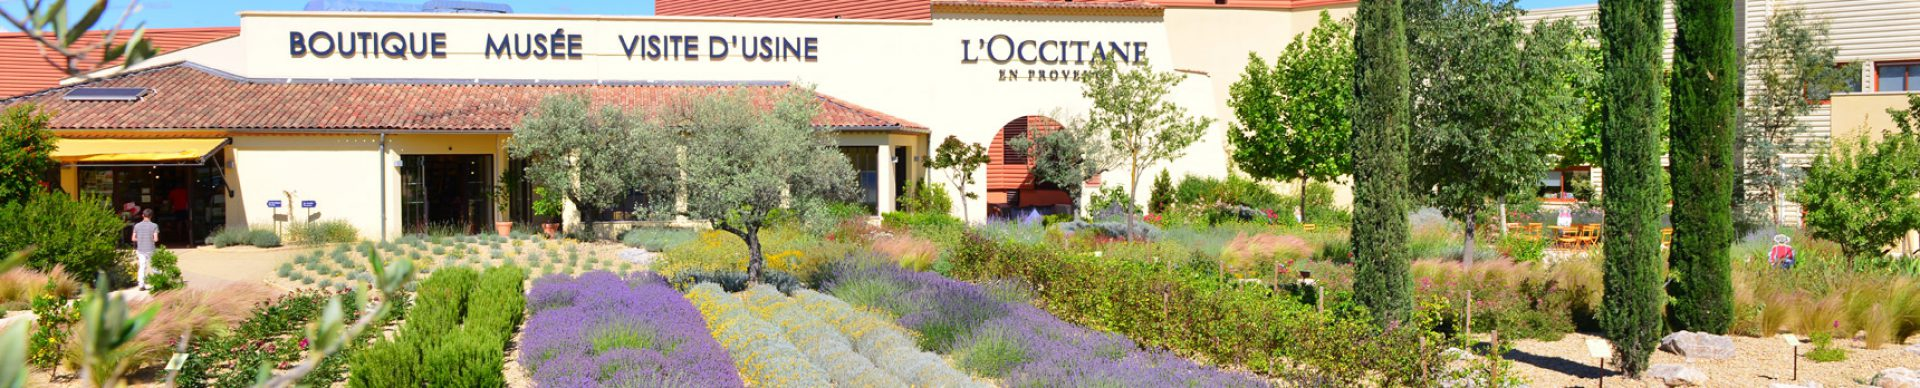 Les jardins de L'Occitane à Manosque ©S.Schlaeintzauer